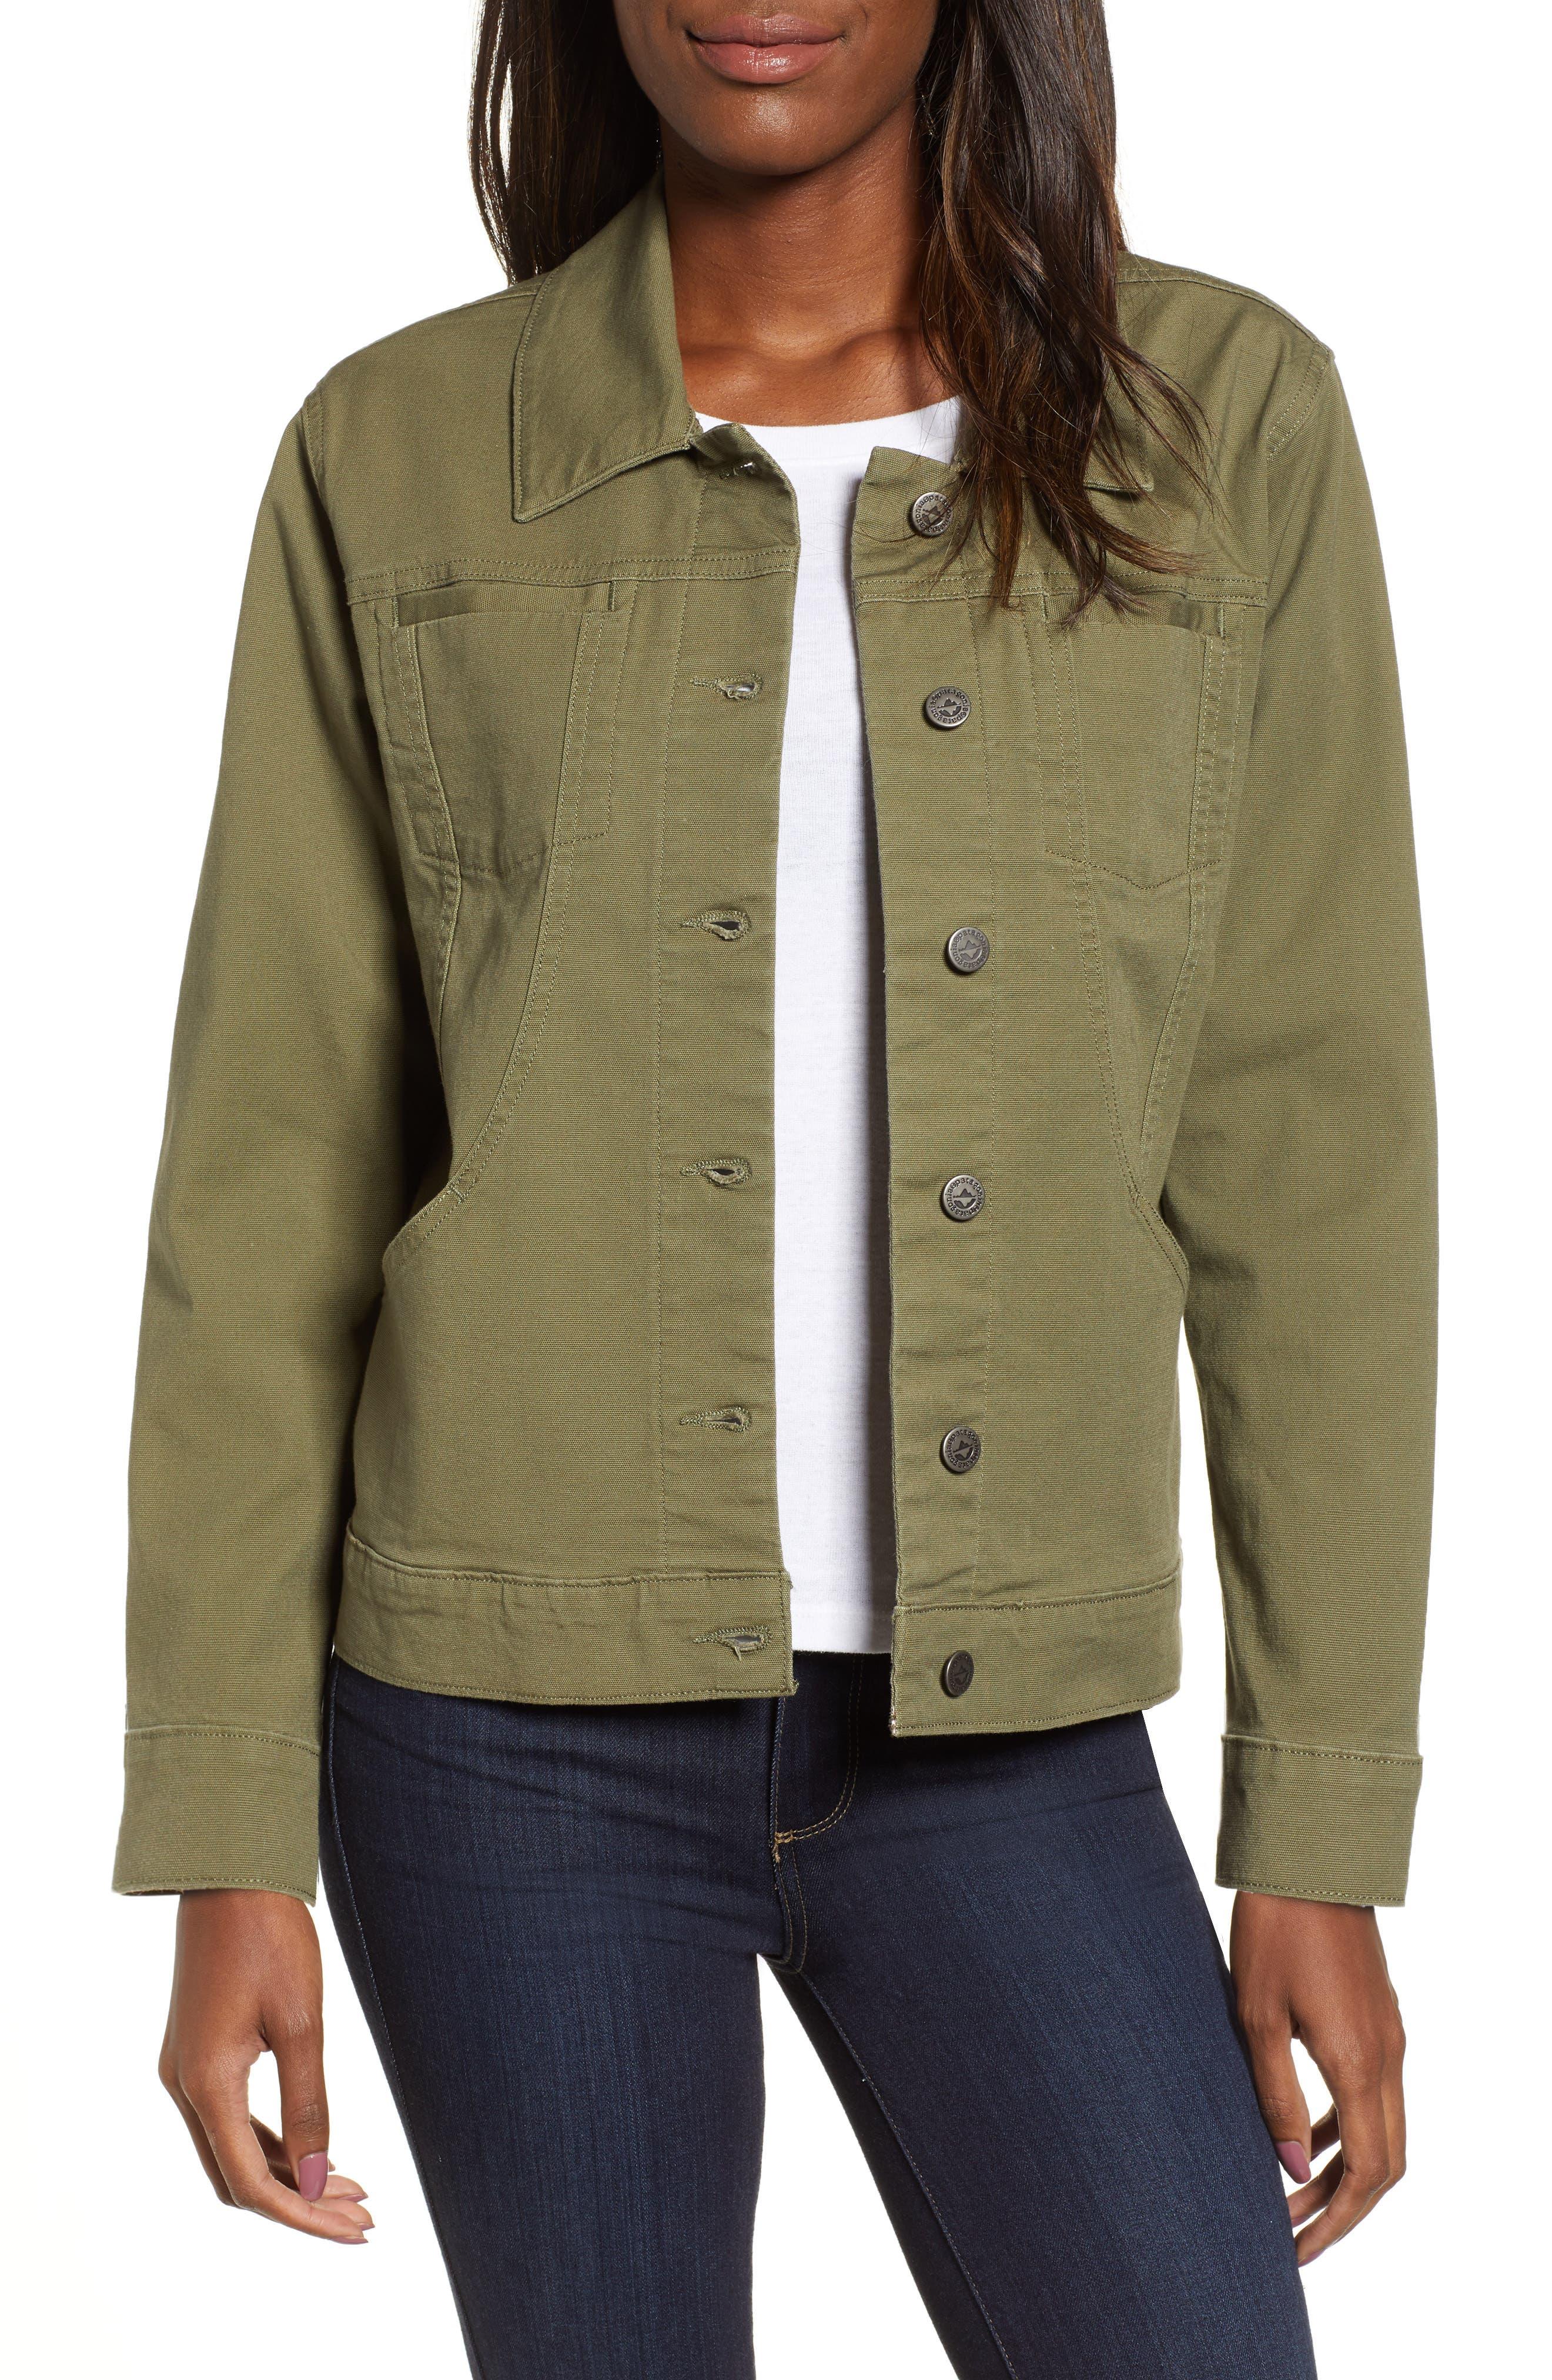 Patagonia Stand Up Shirt Jacket, Green